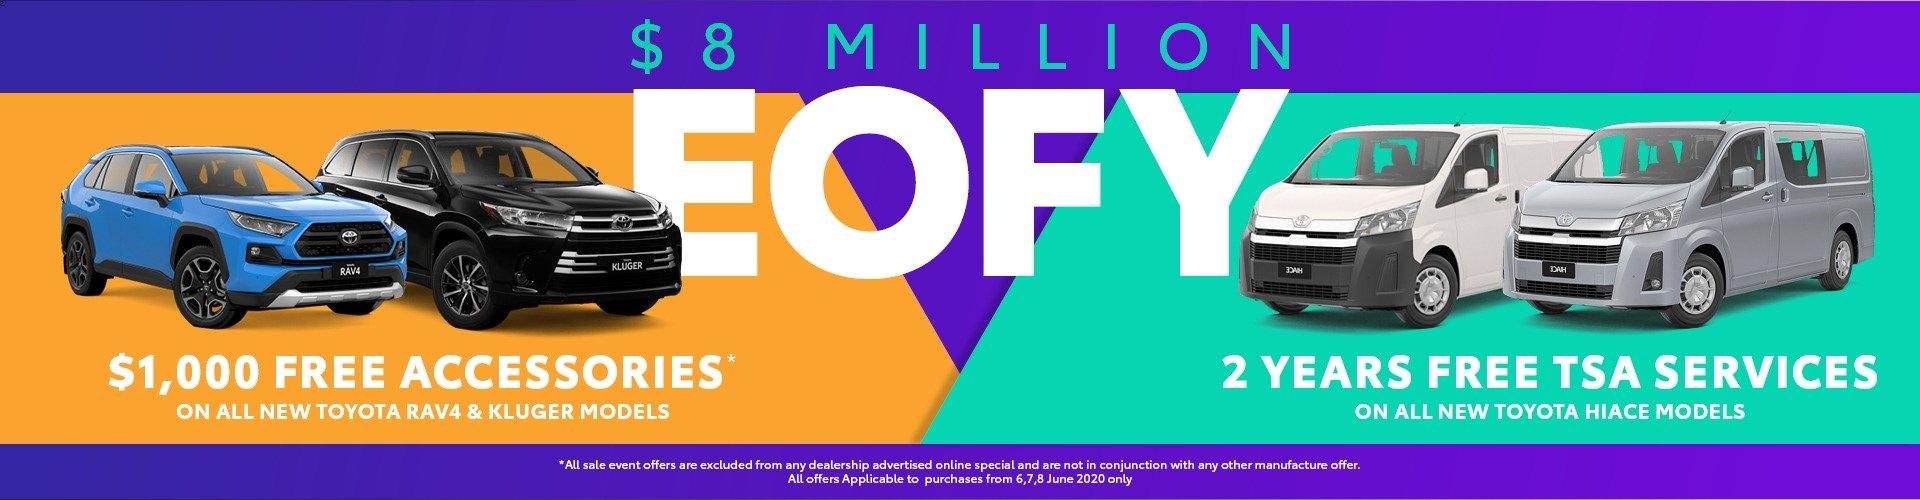 $8 MILLION EOFY EVENT